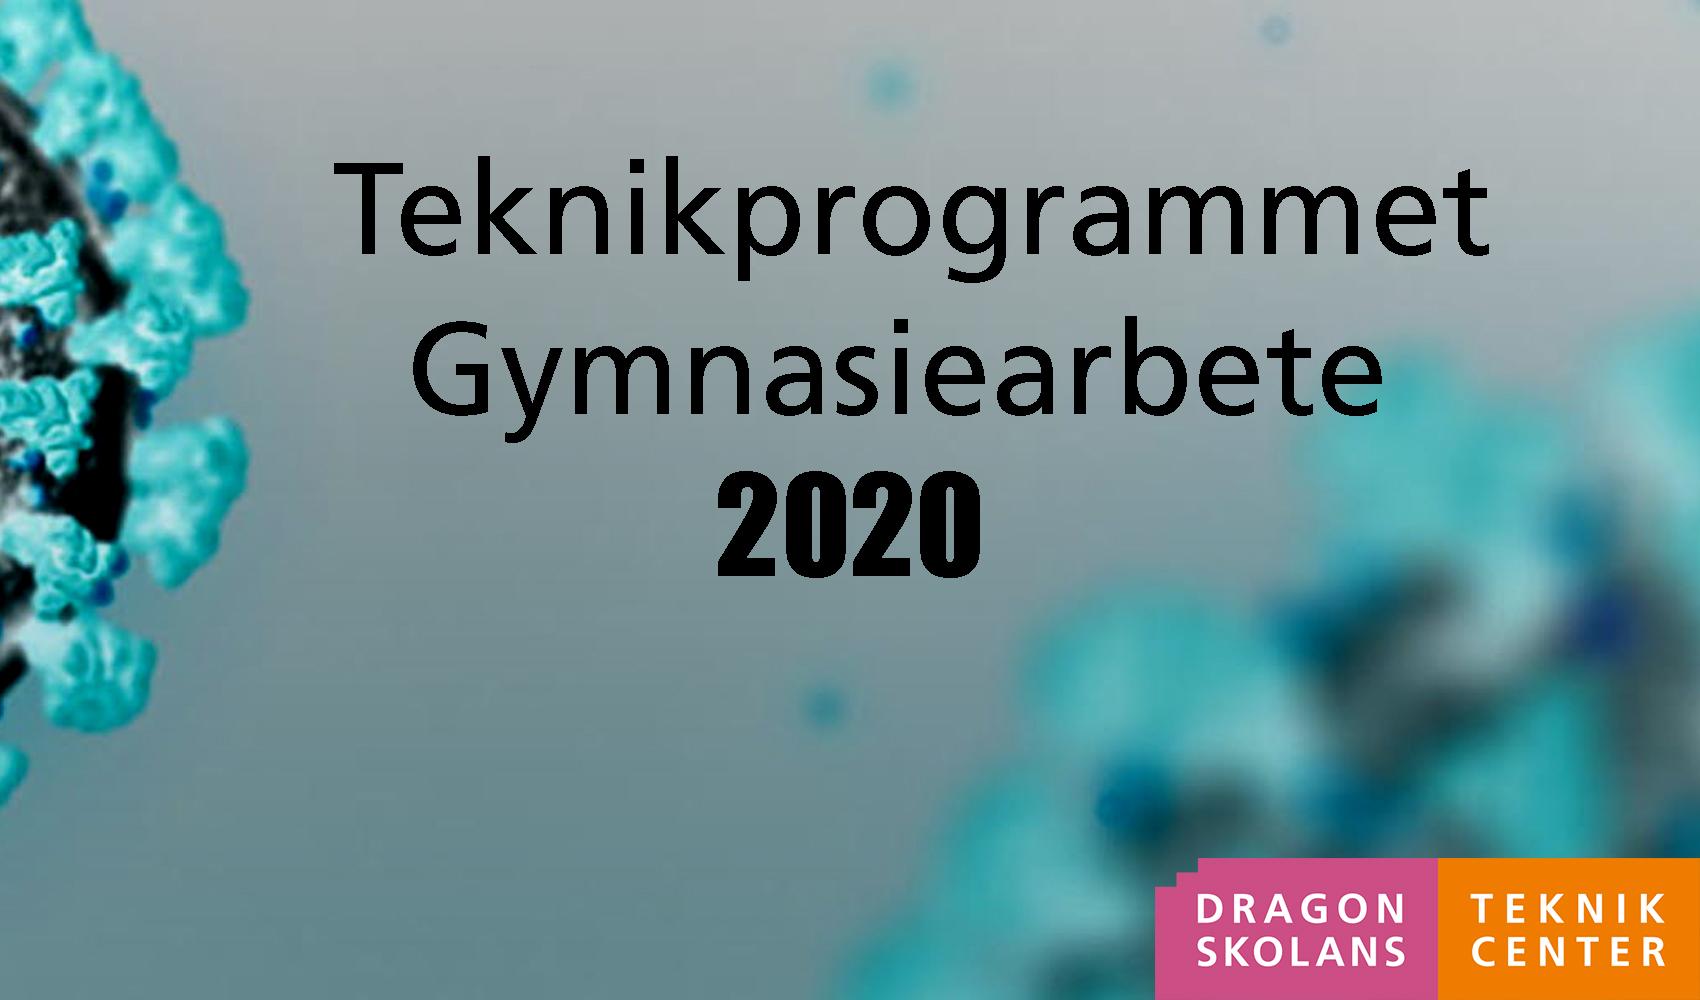 Teknikprogrammet GARB 2020